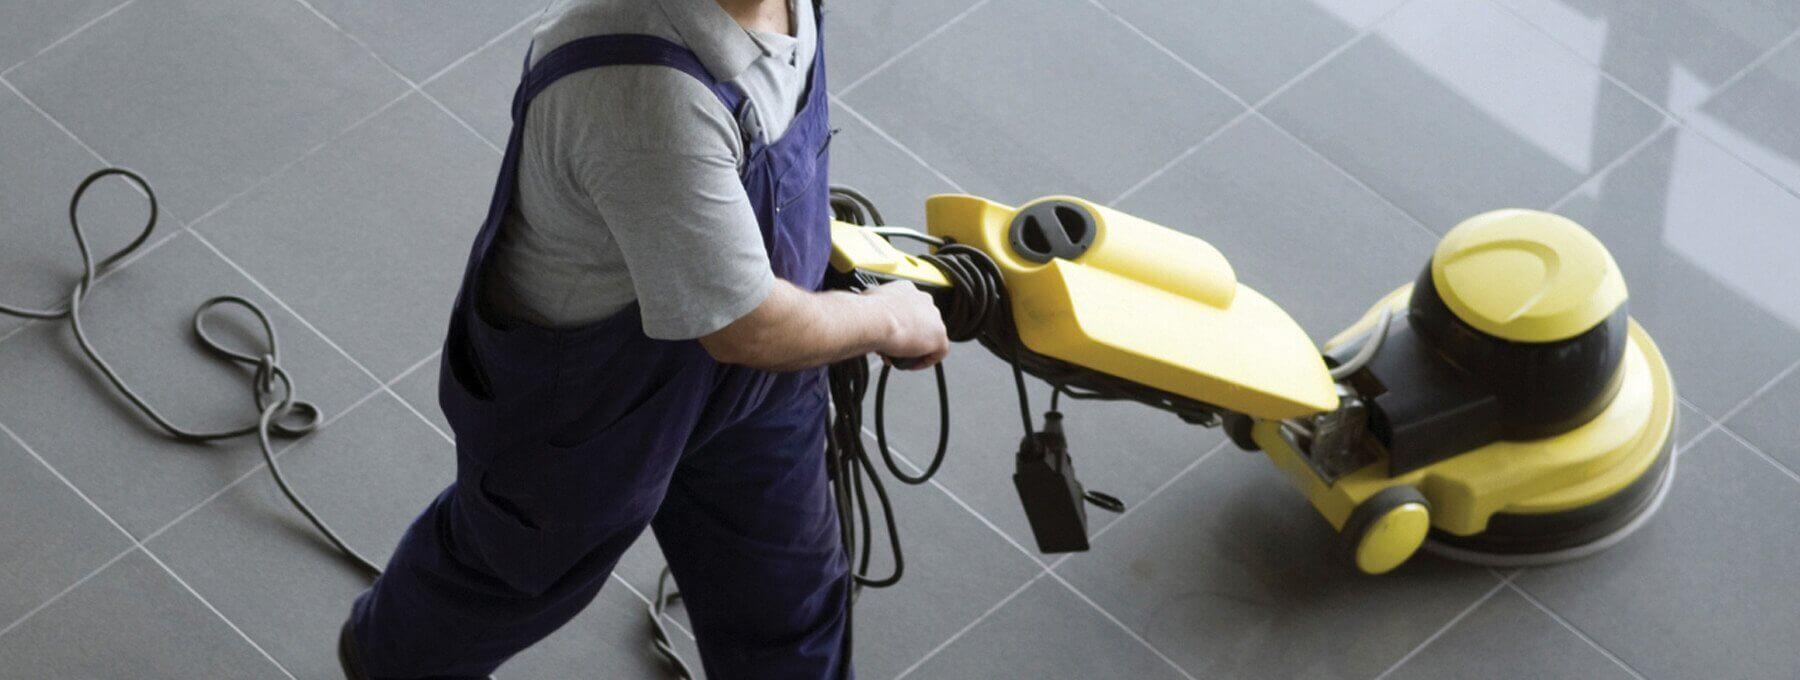 CleadAid Direct - Wellington Cleaners